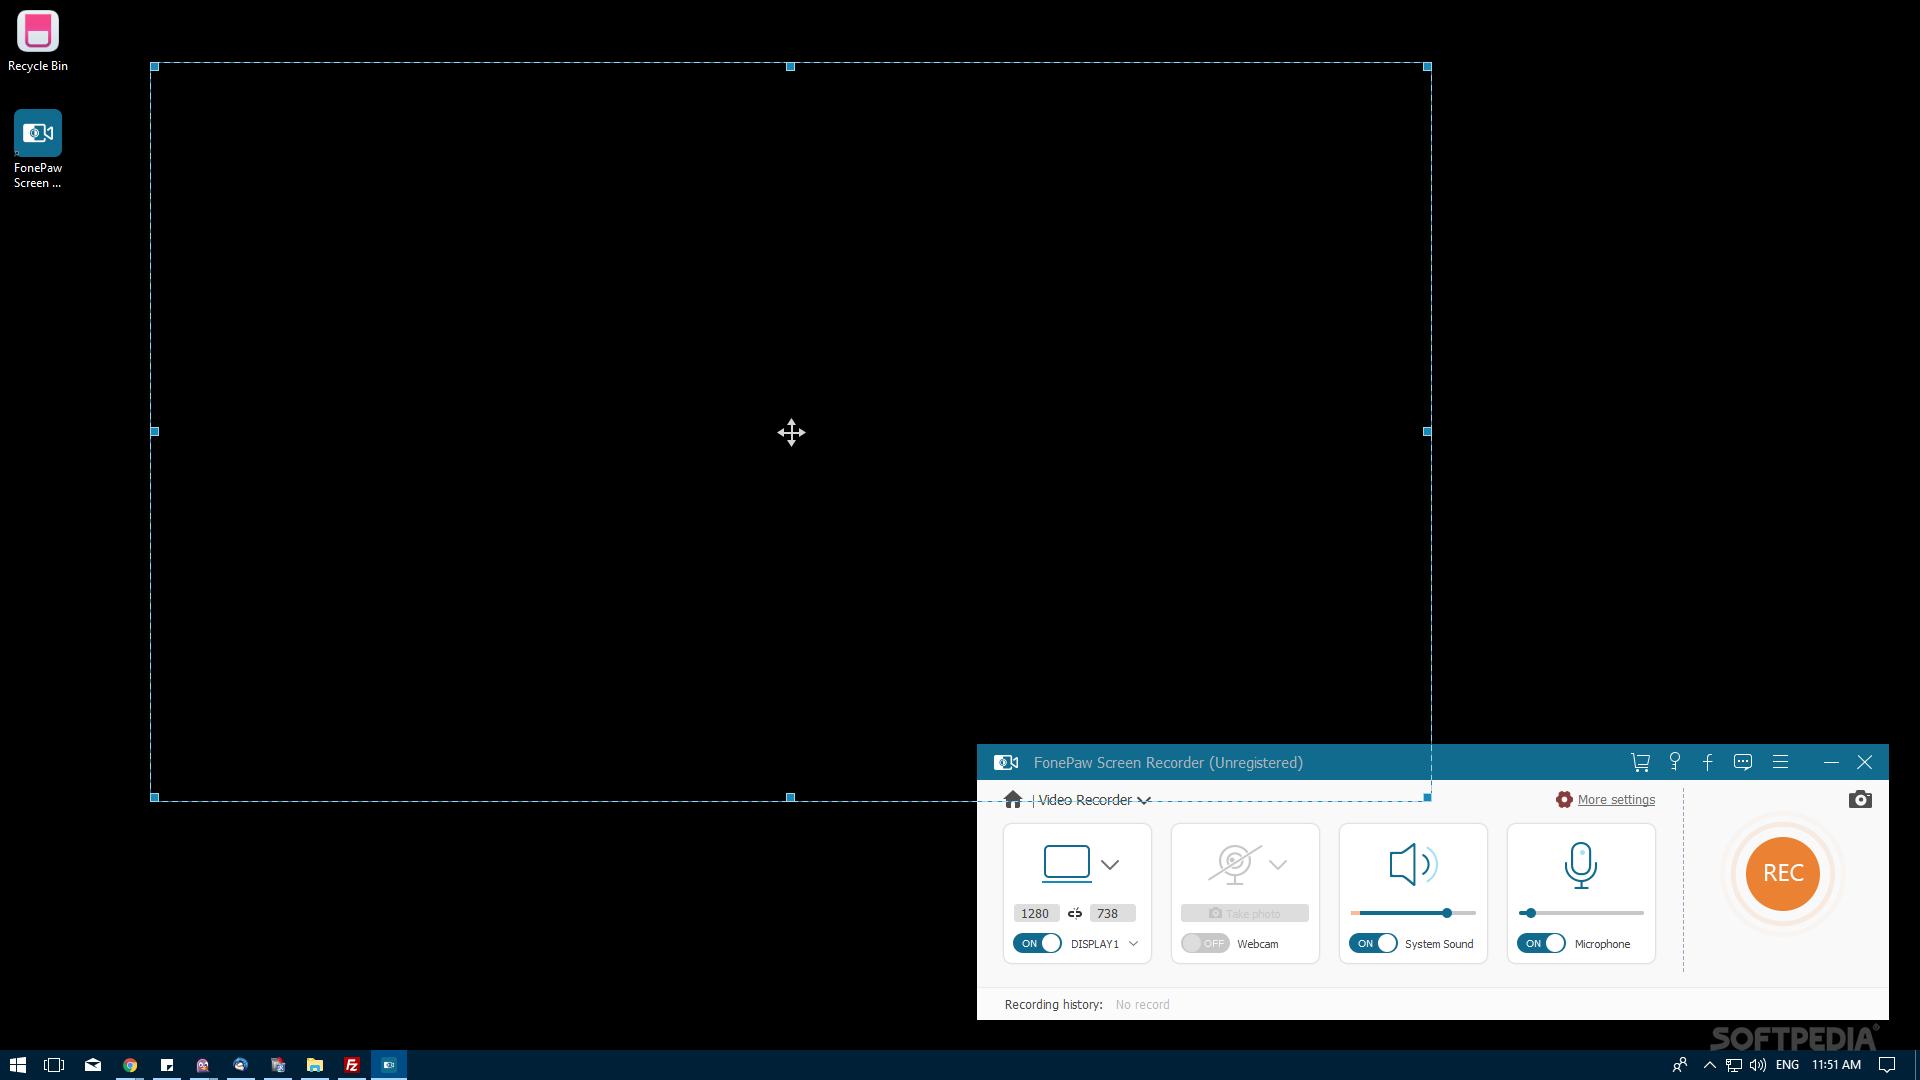 fonepaw screen recorder for mac